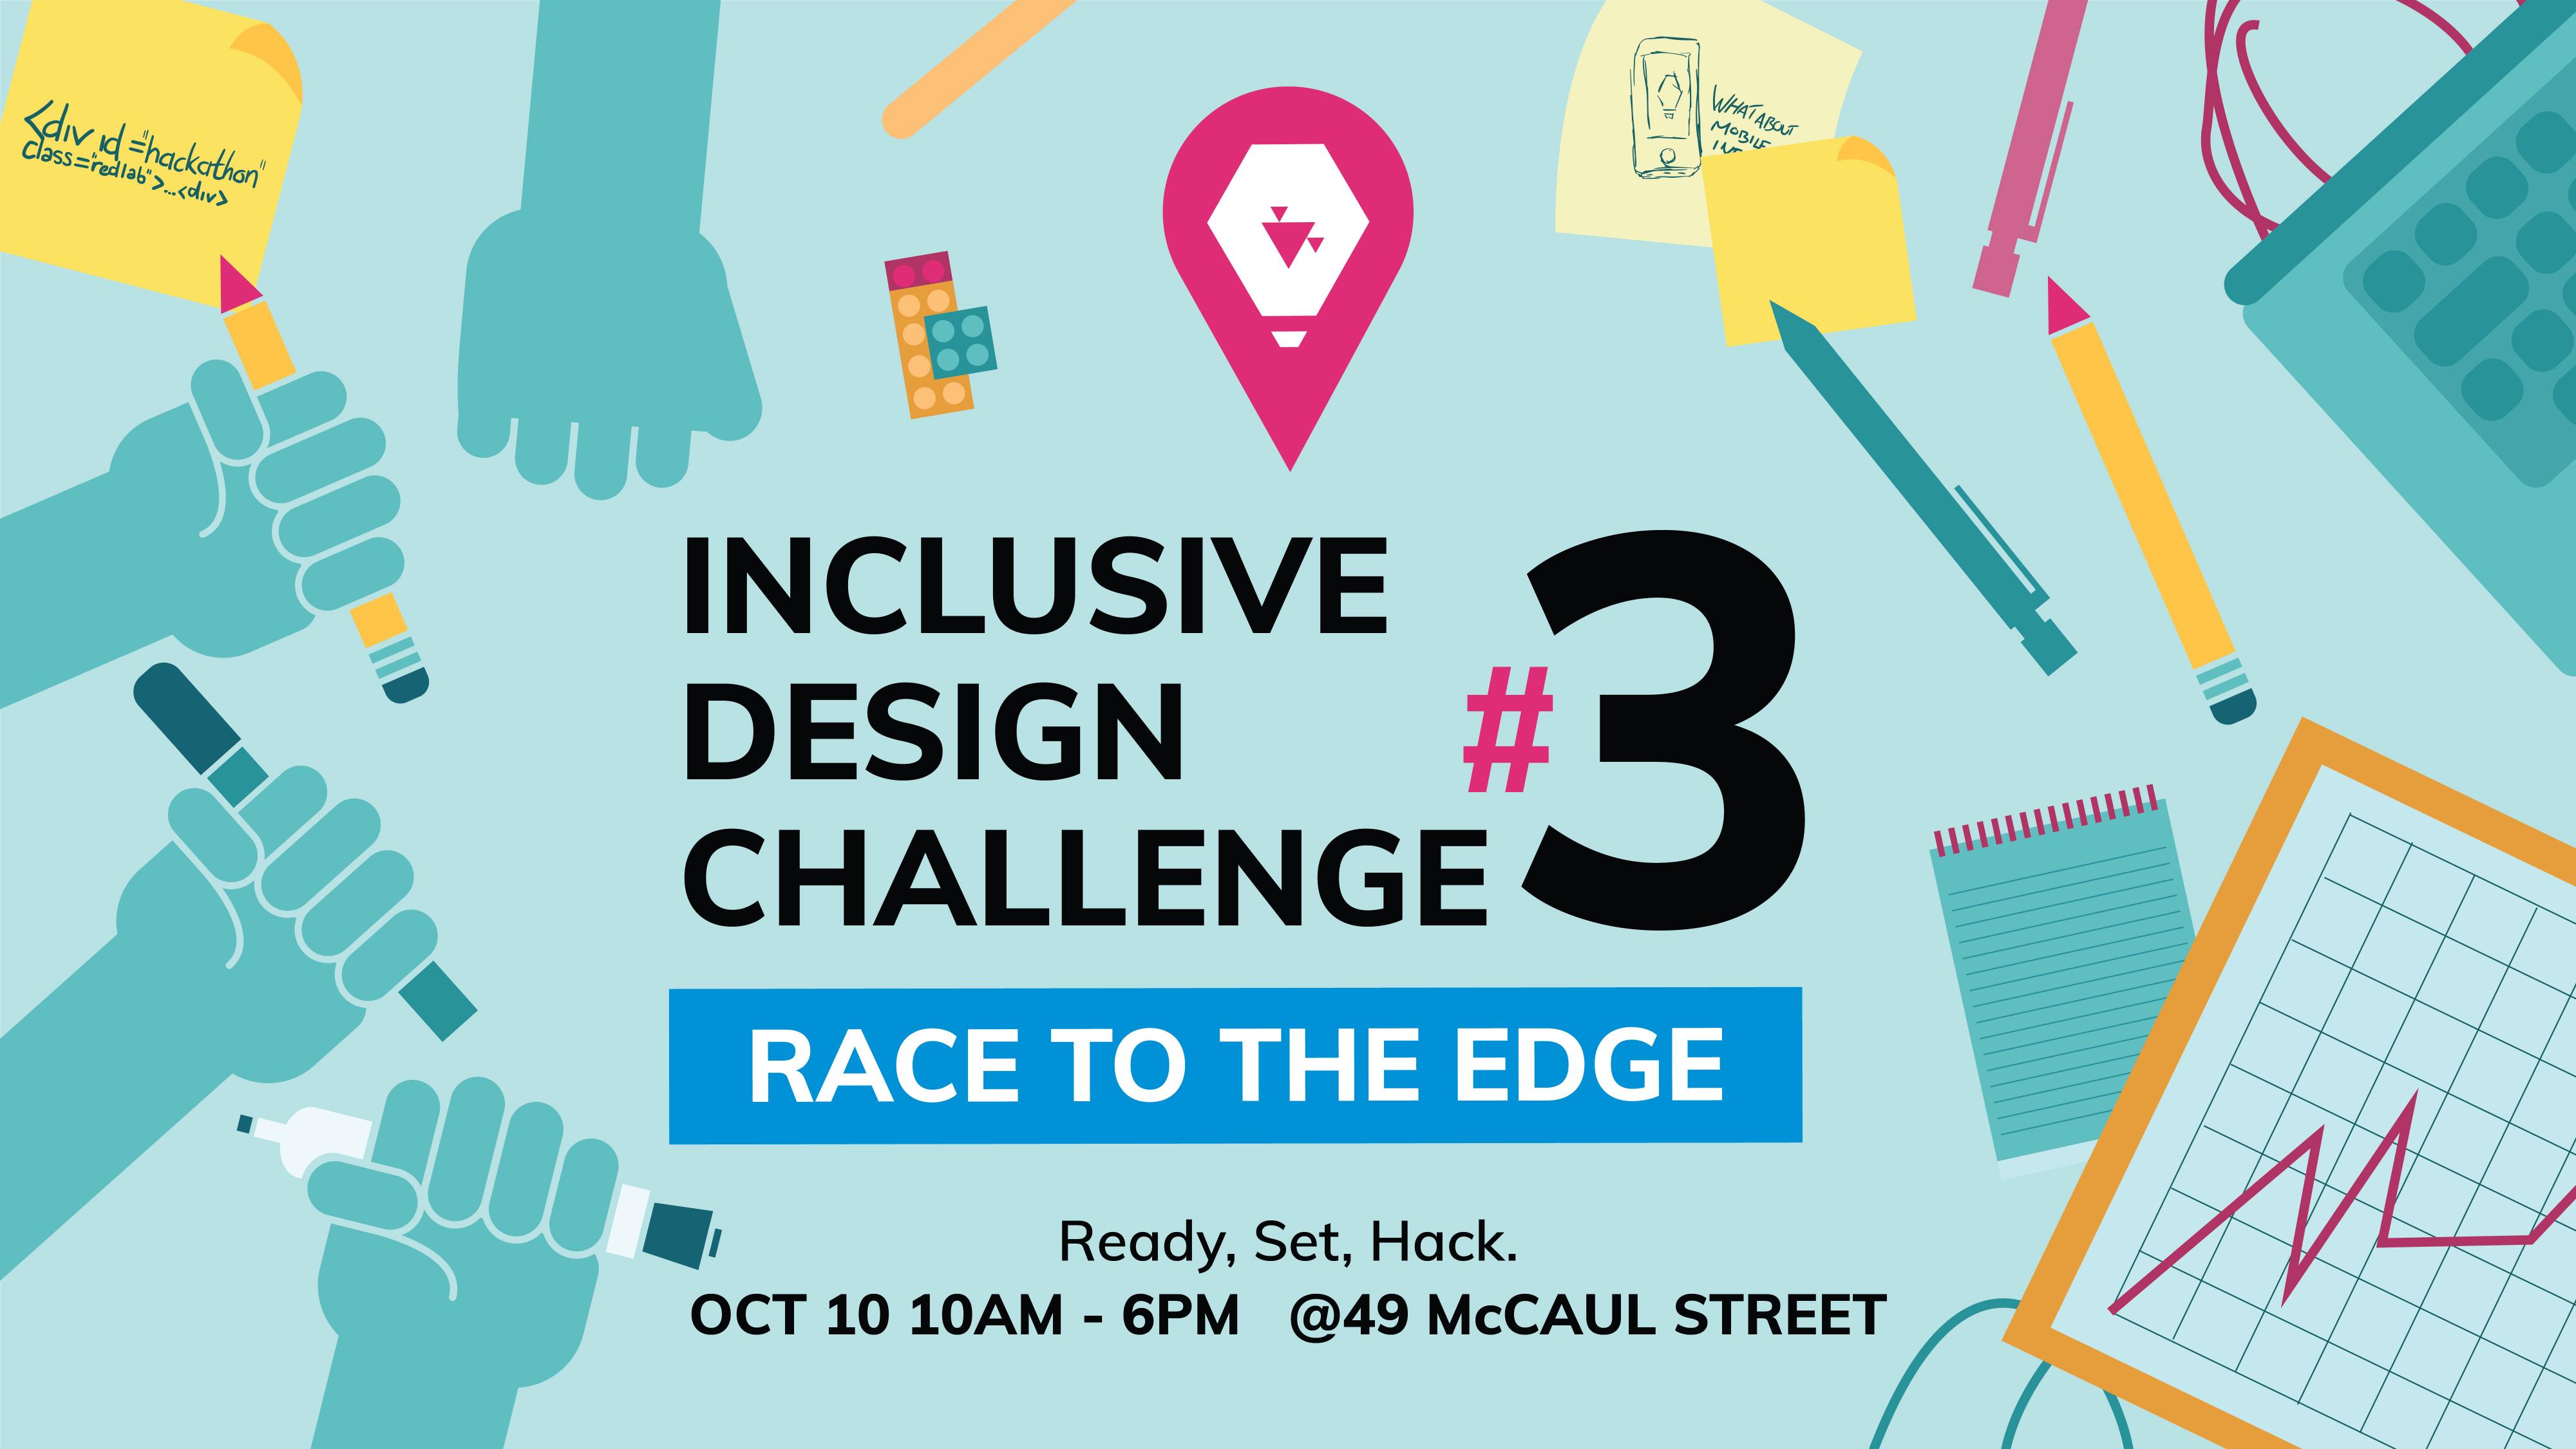 Inclusive Design Challenge: Race-to-the-Edge